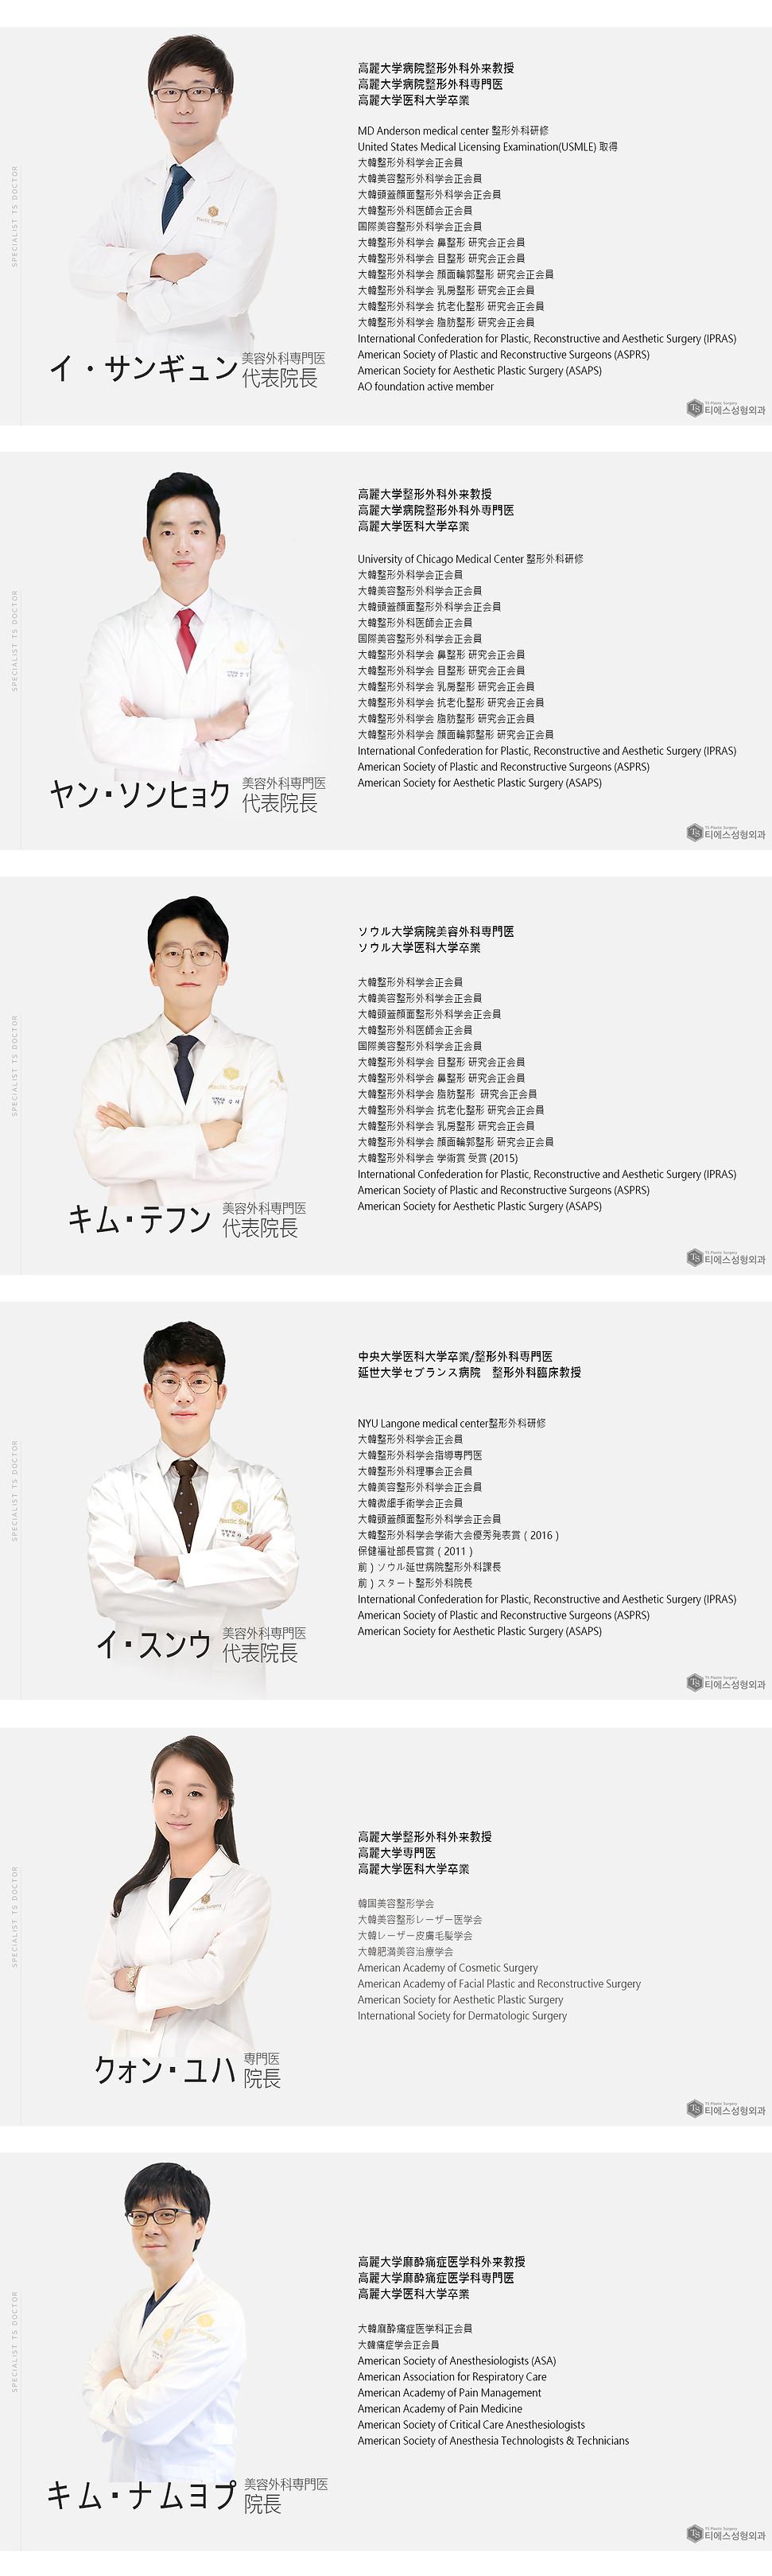 jp_의료진소개_201213.jpg